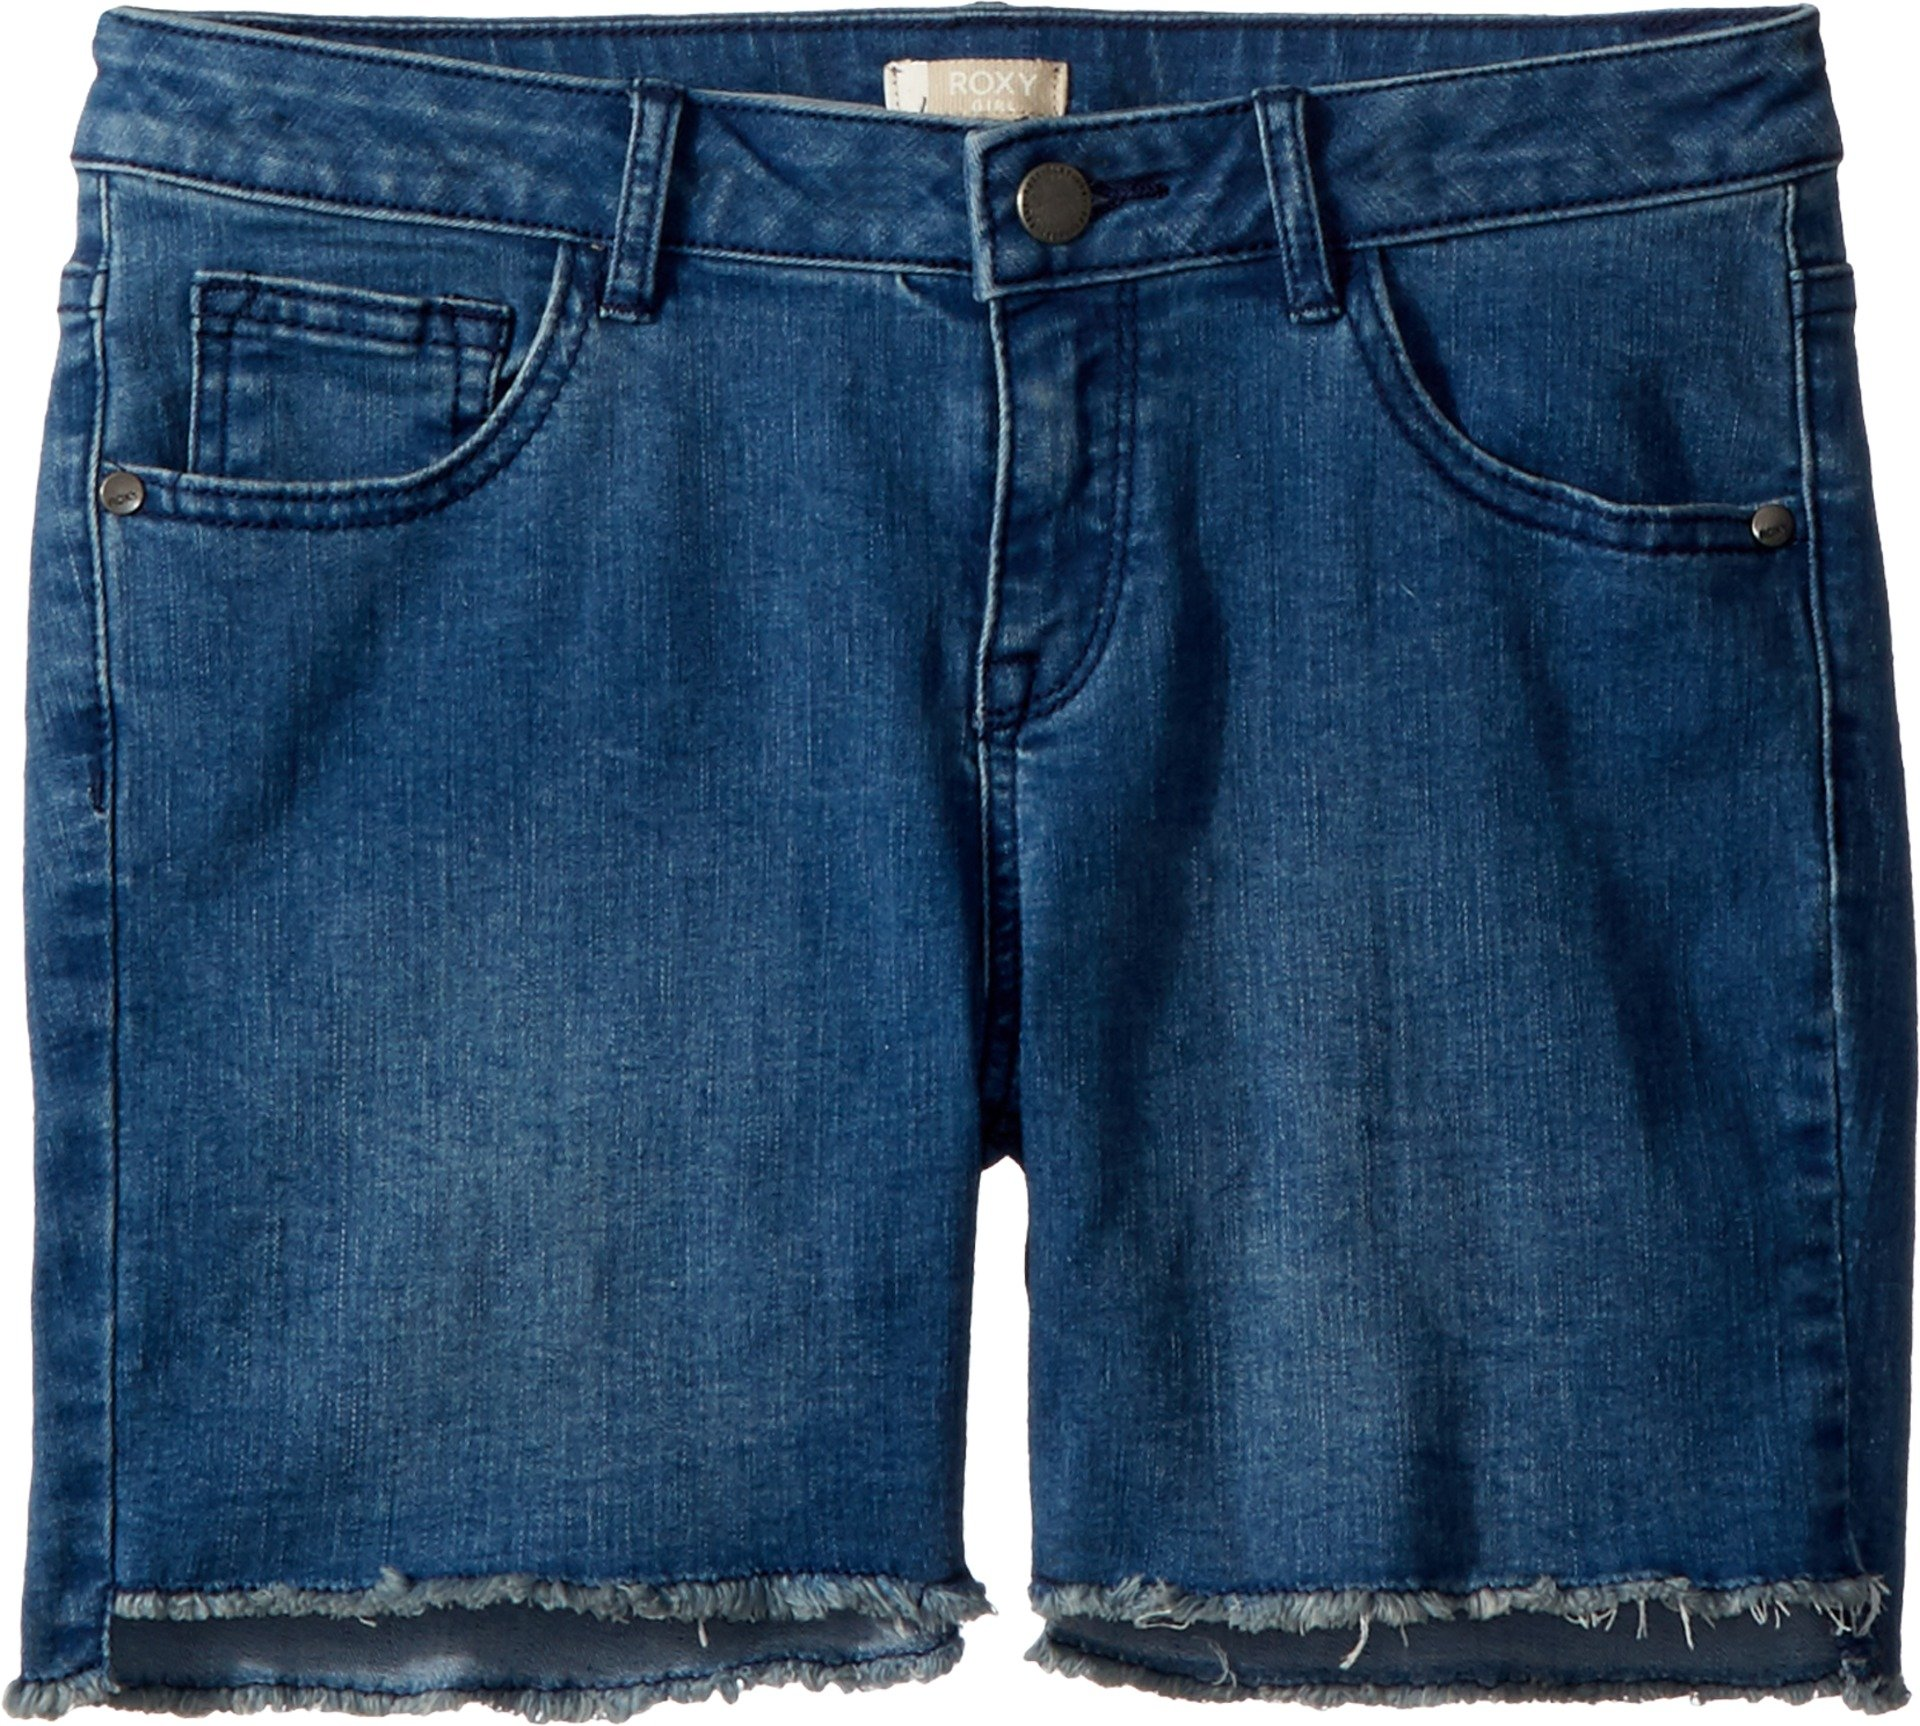 Roxy Big Girls' Light Hearted Denim Shorts, Retro Blue, 12